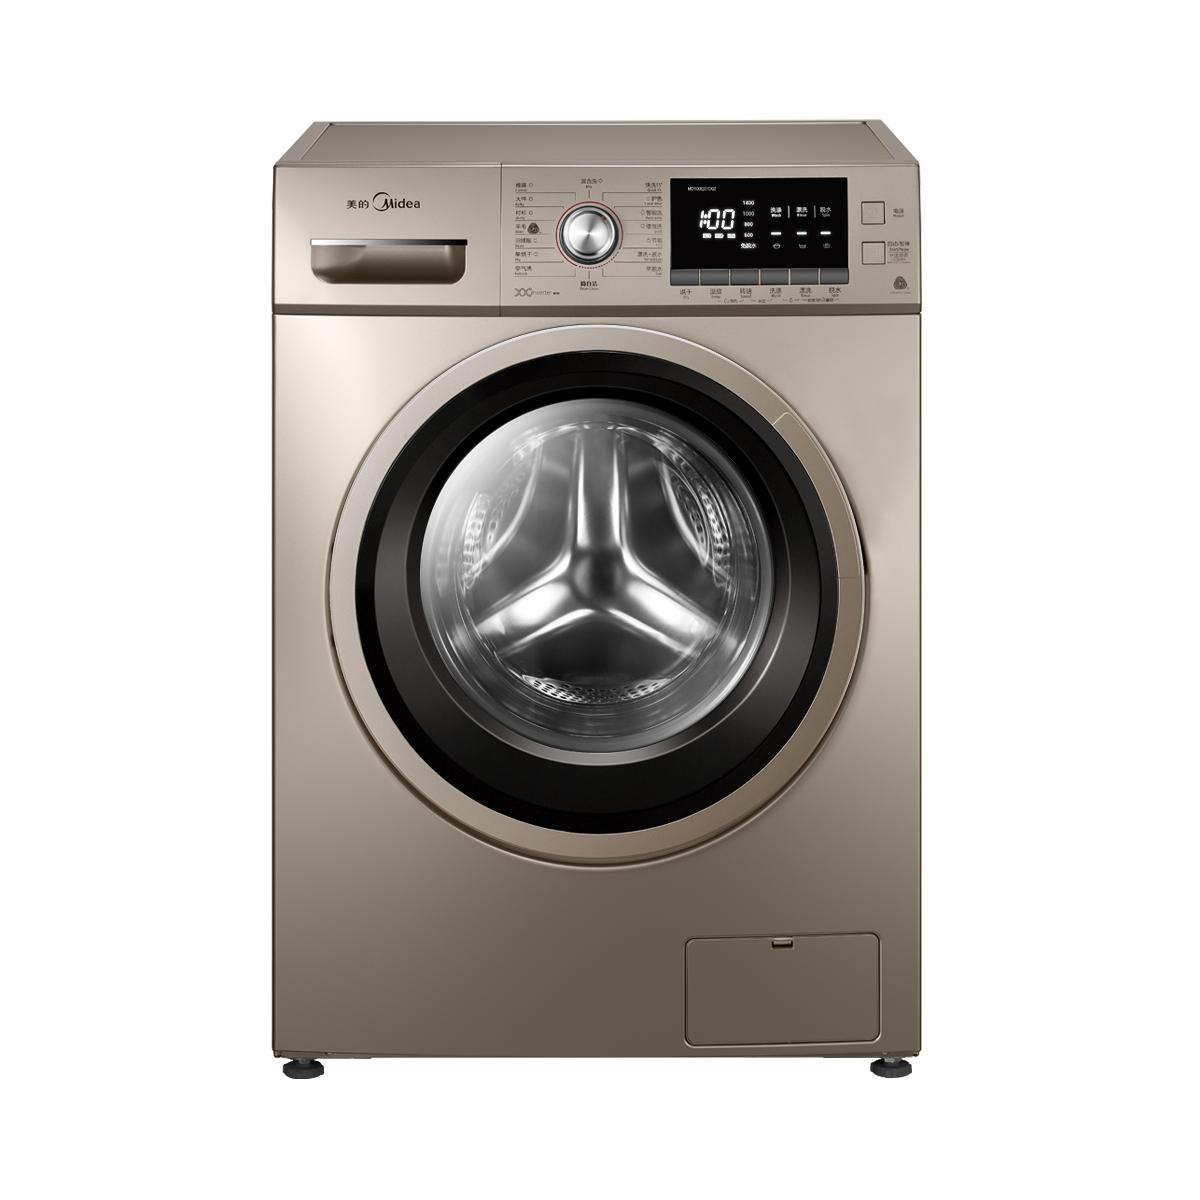 Midea/美的 MD100Q31DG5洗衣机 说明书.pdf